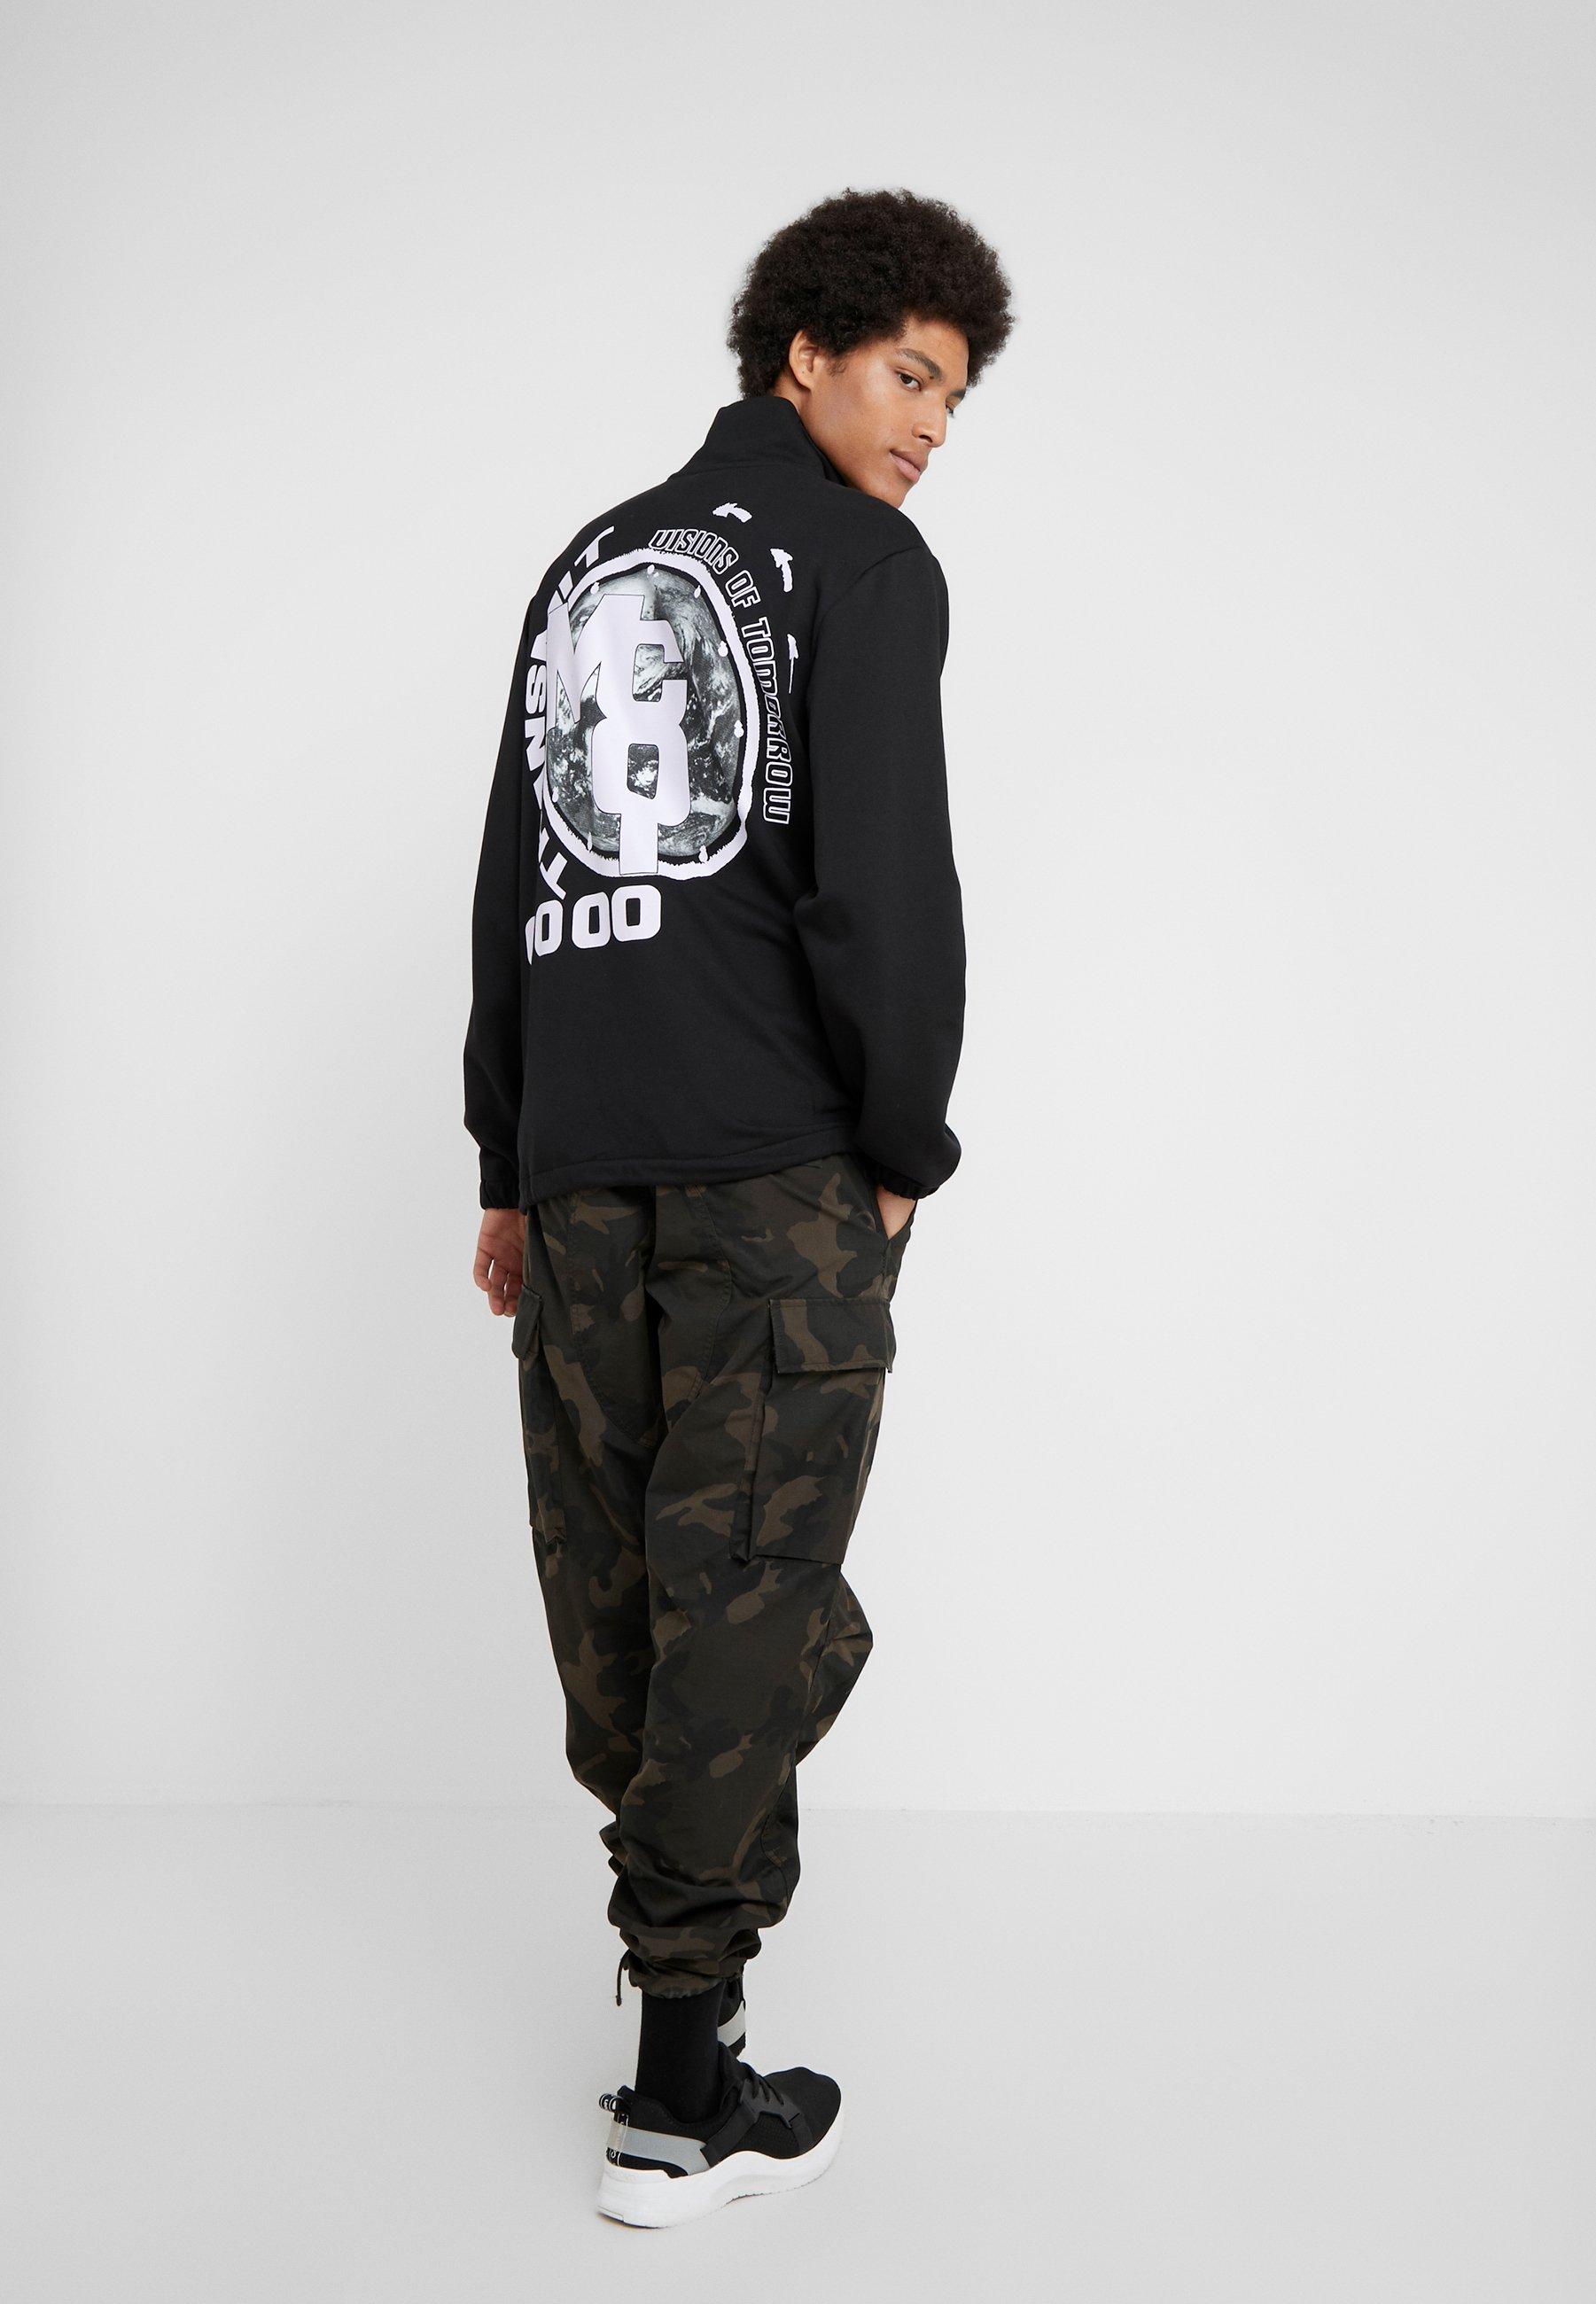 Mcq Black Darkest Alexander PulloverSweatshirt Sports Mcqueen RSAjq54Lc3